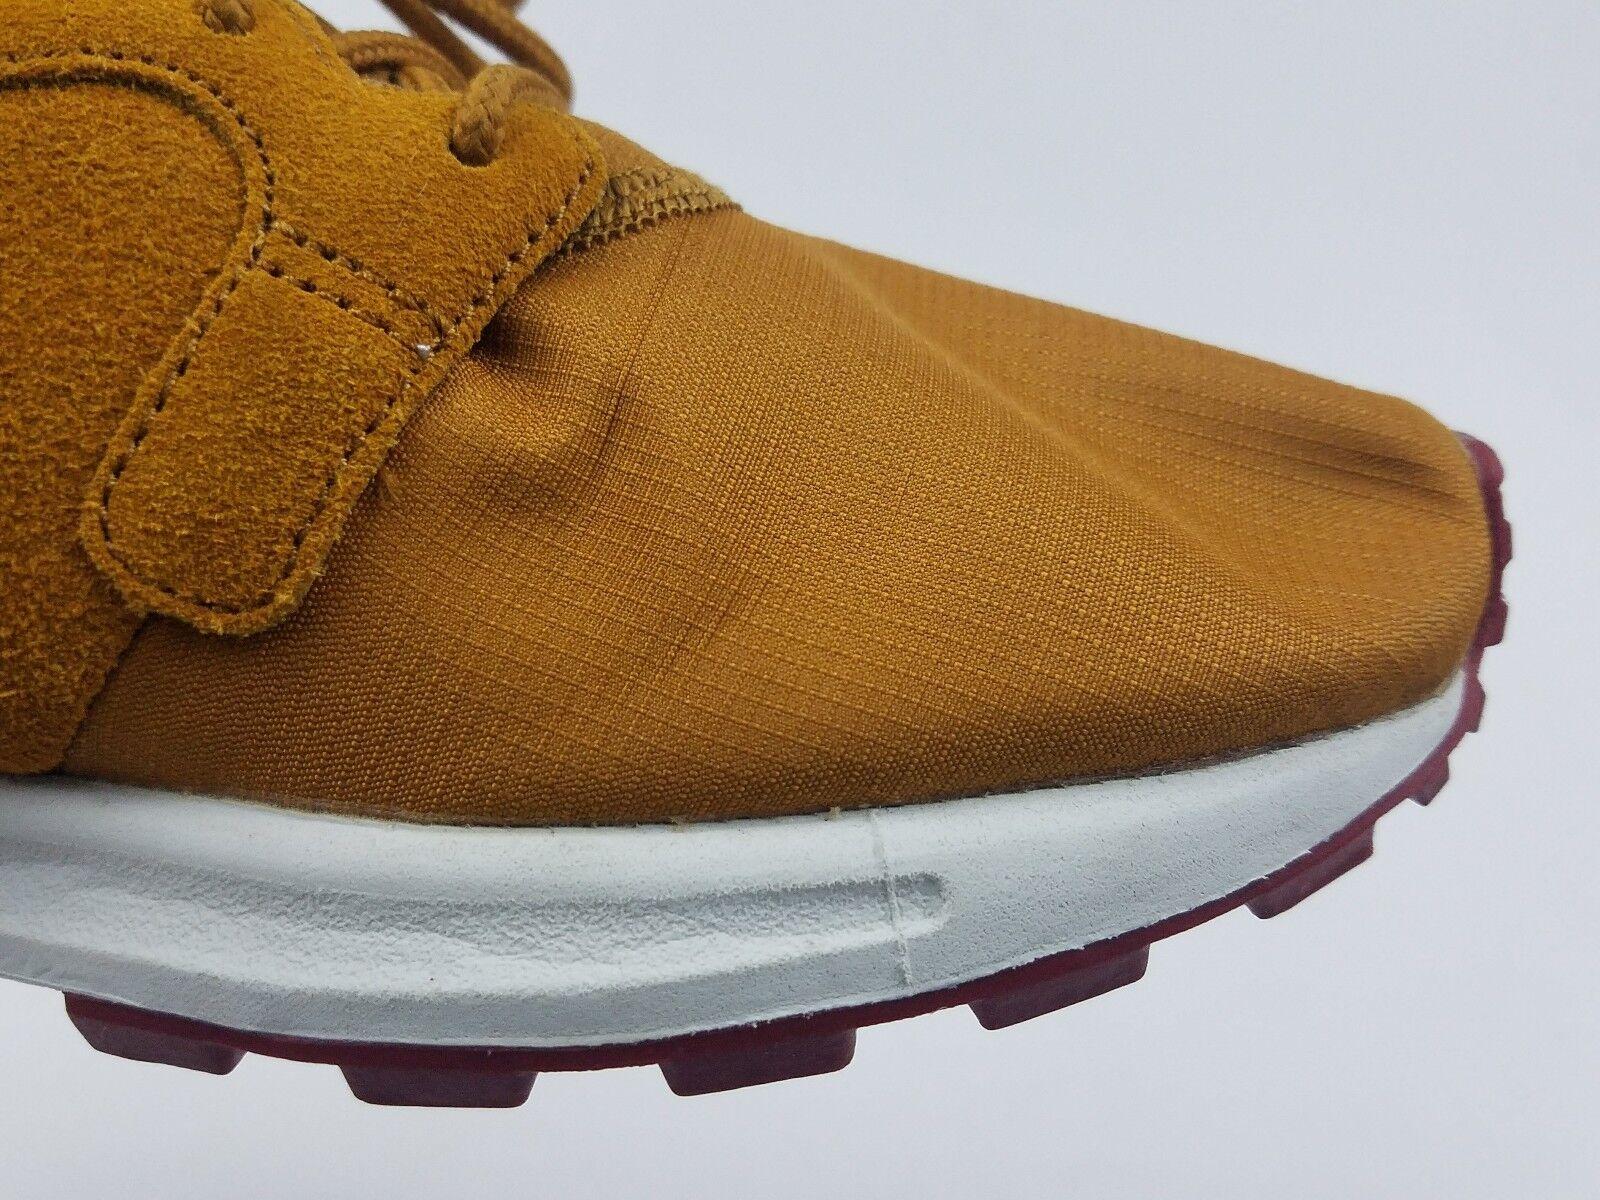 Nike air berwuda premium - wste ocker 9,5 gold ist casual schuhen sz 9,5 ocker 844978 neue 863c80